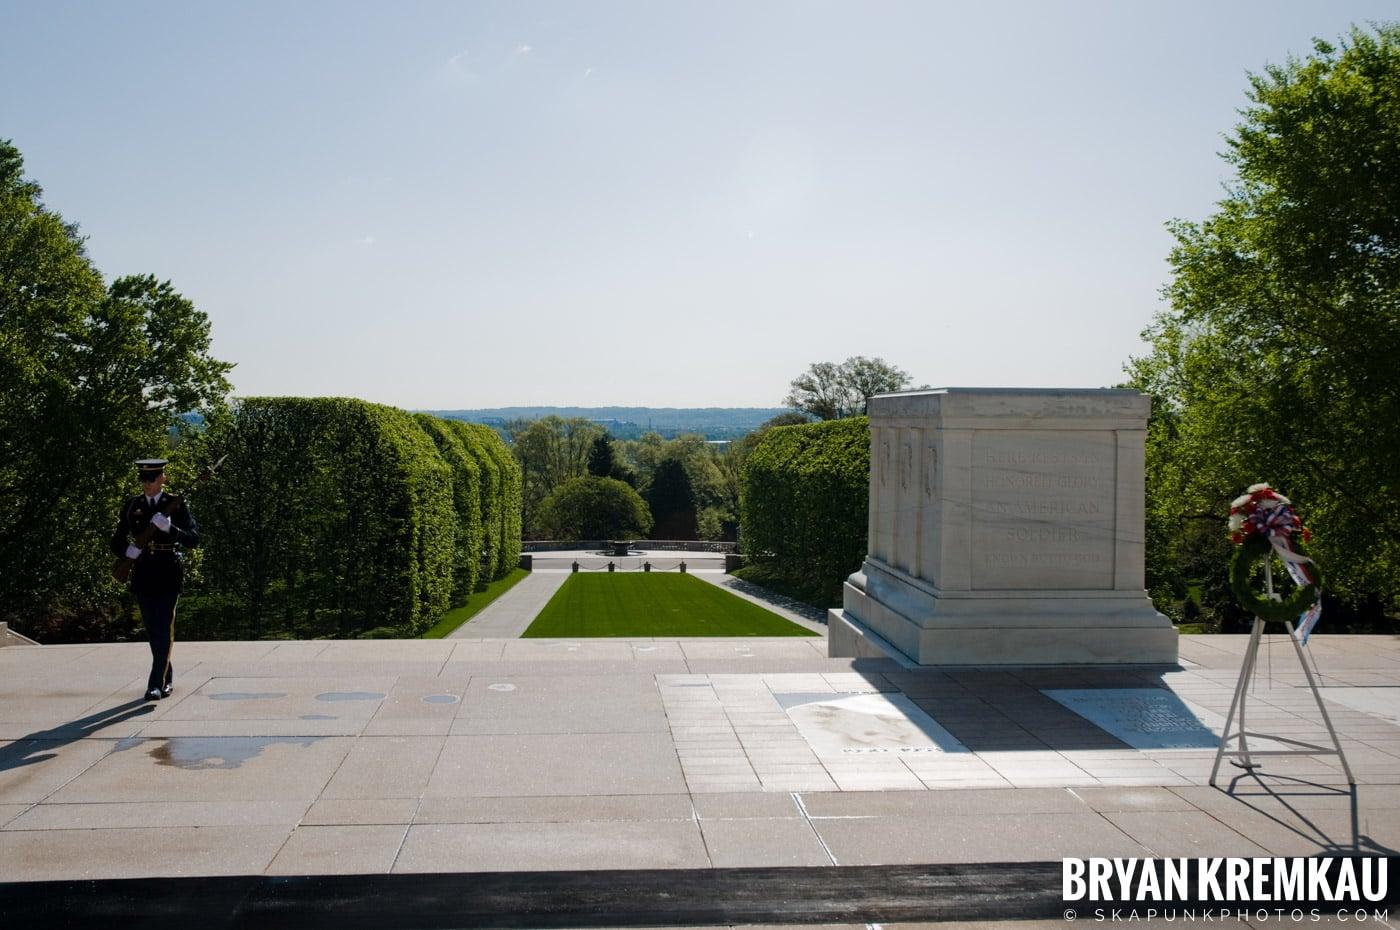 Washington, DC Trip - Day 3 - 4.10.10 (35)